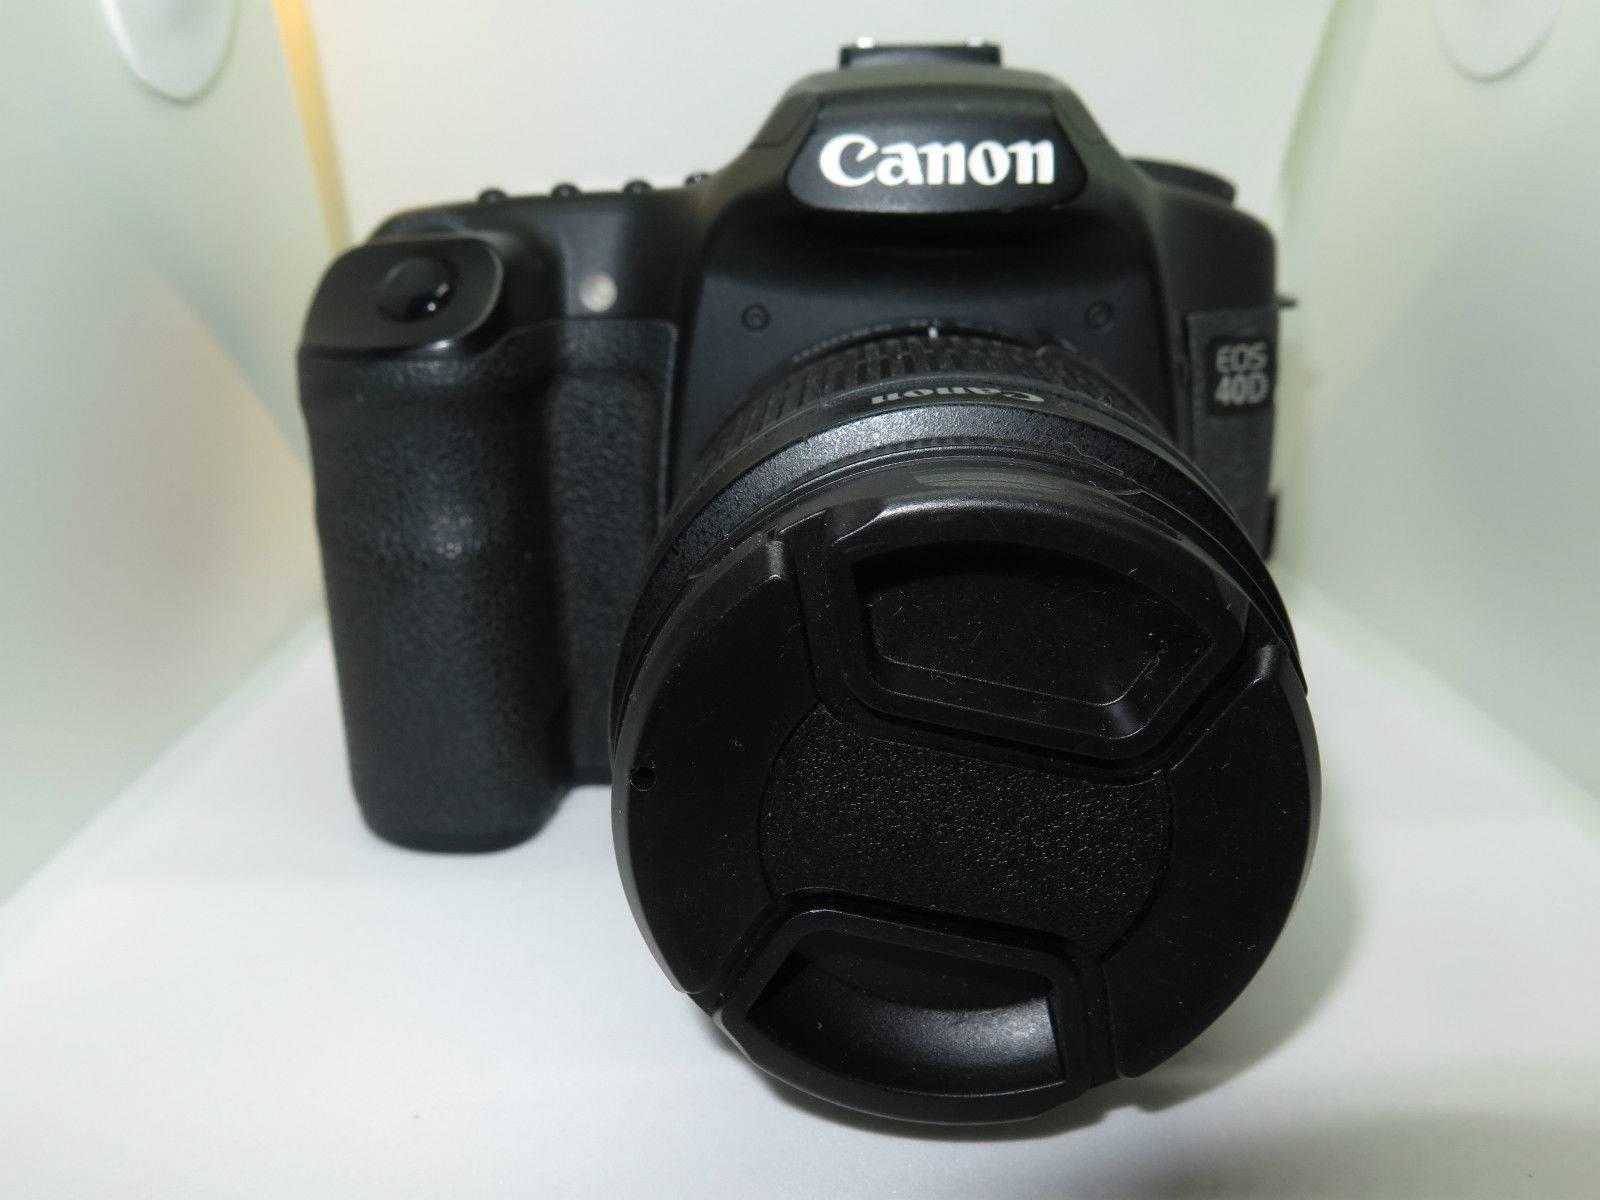 Canon EOS 40D 10 MP Digital Camera body +Canon 18-55 IS Lens +16gb